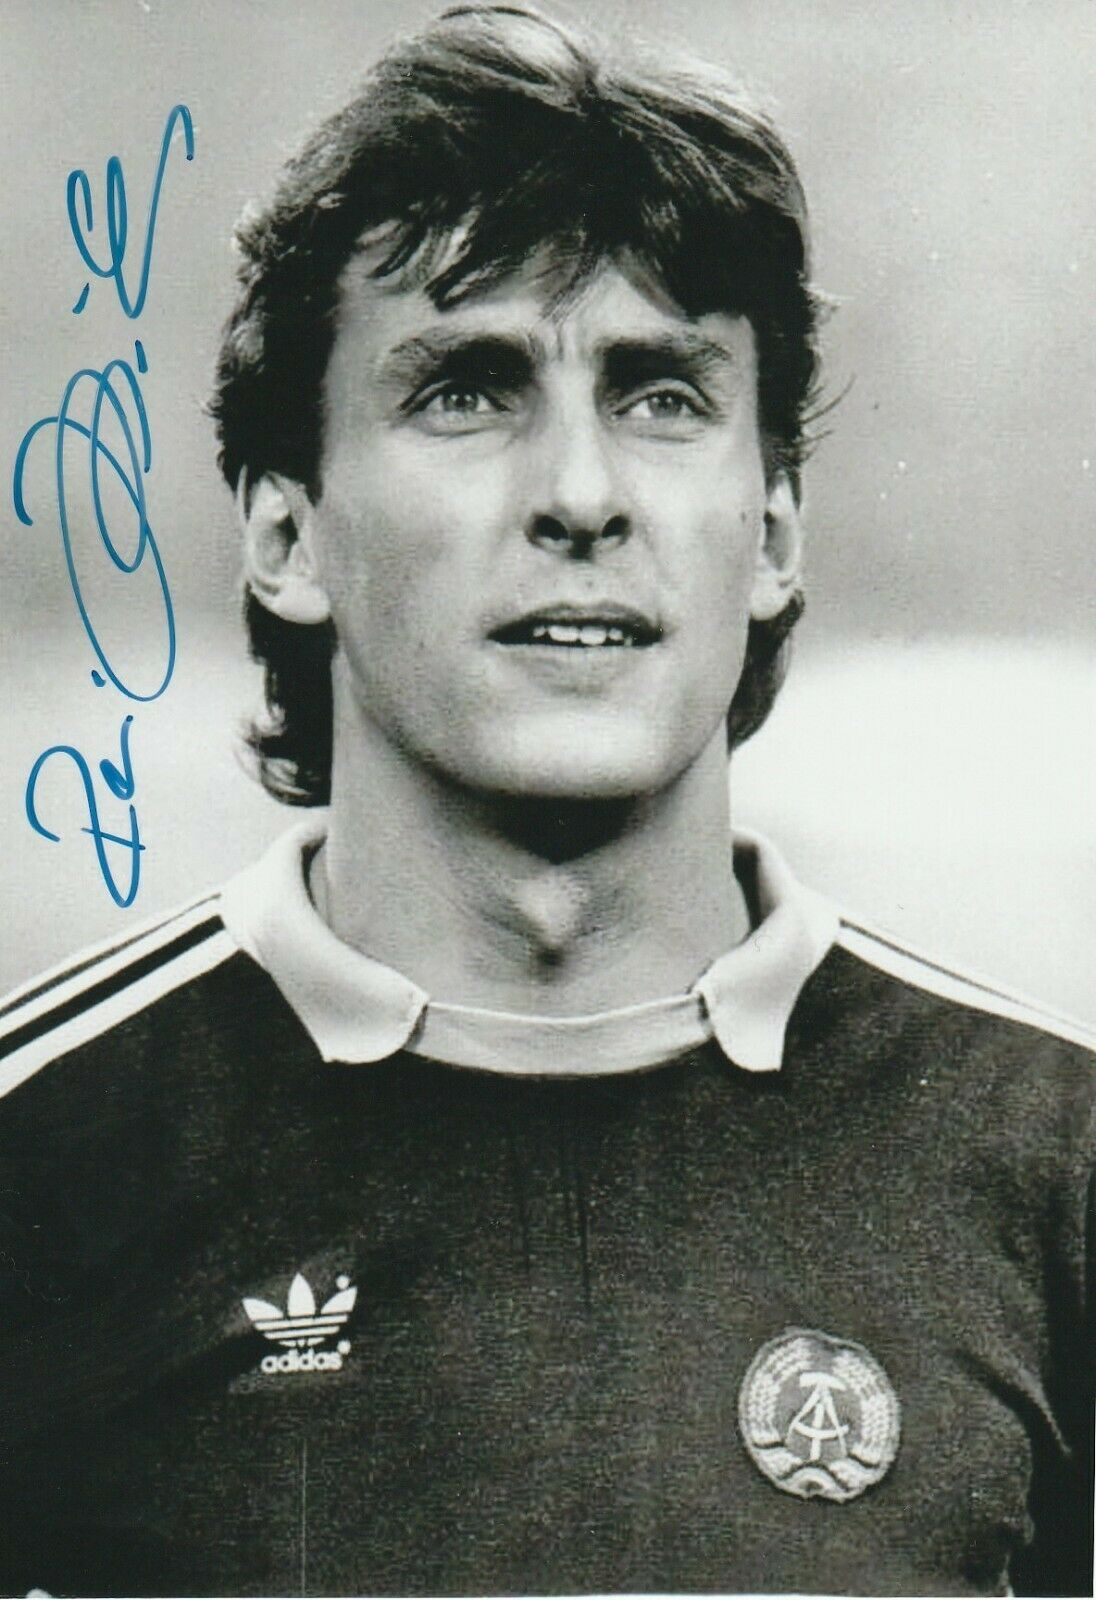 Rene Muller Ddr Nationalspieler Foto S W Signiert Eur 1 00 Orginale Unterschrift Von Rene Muller Ddr Nati Autogramm Ddr Fussball Nationalmannschaft